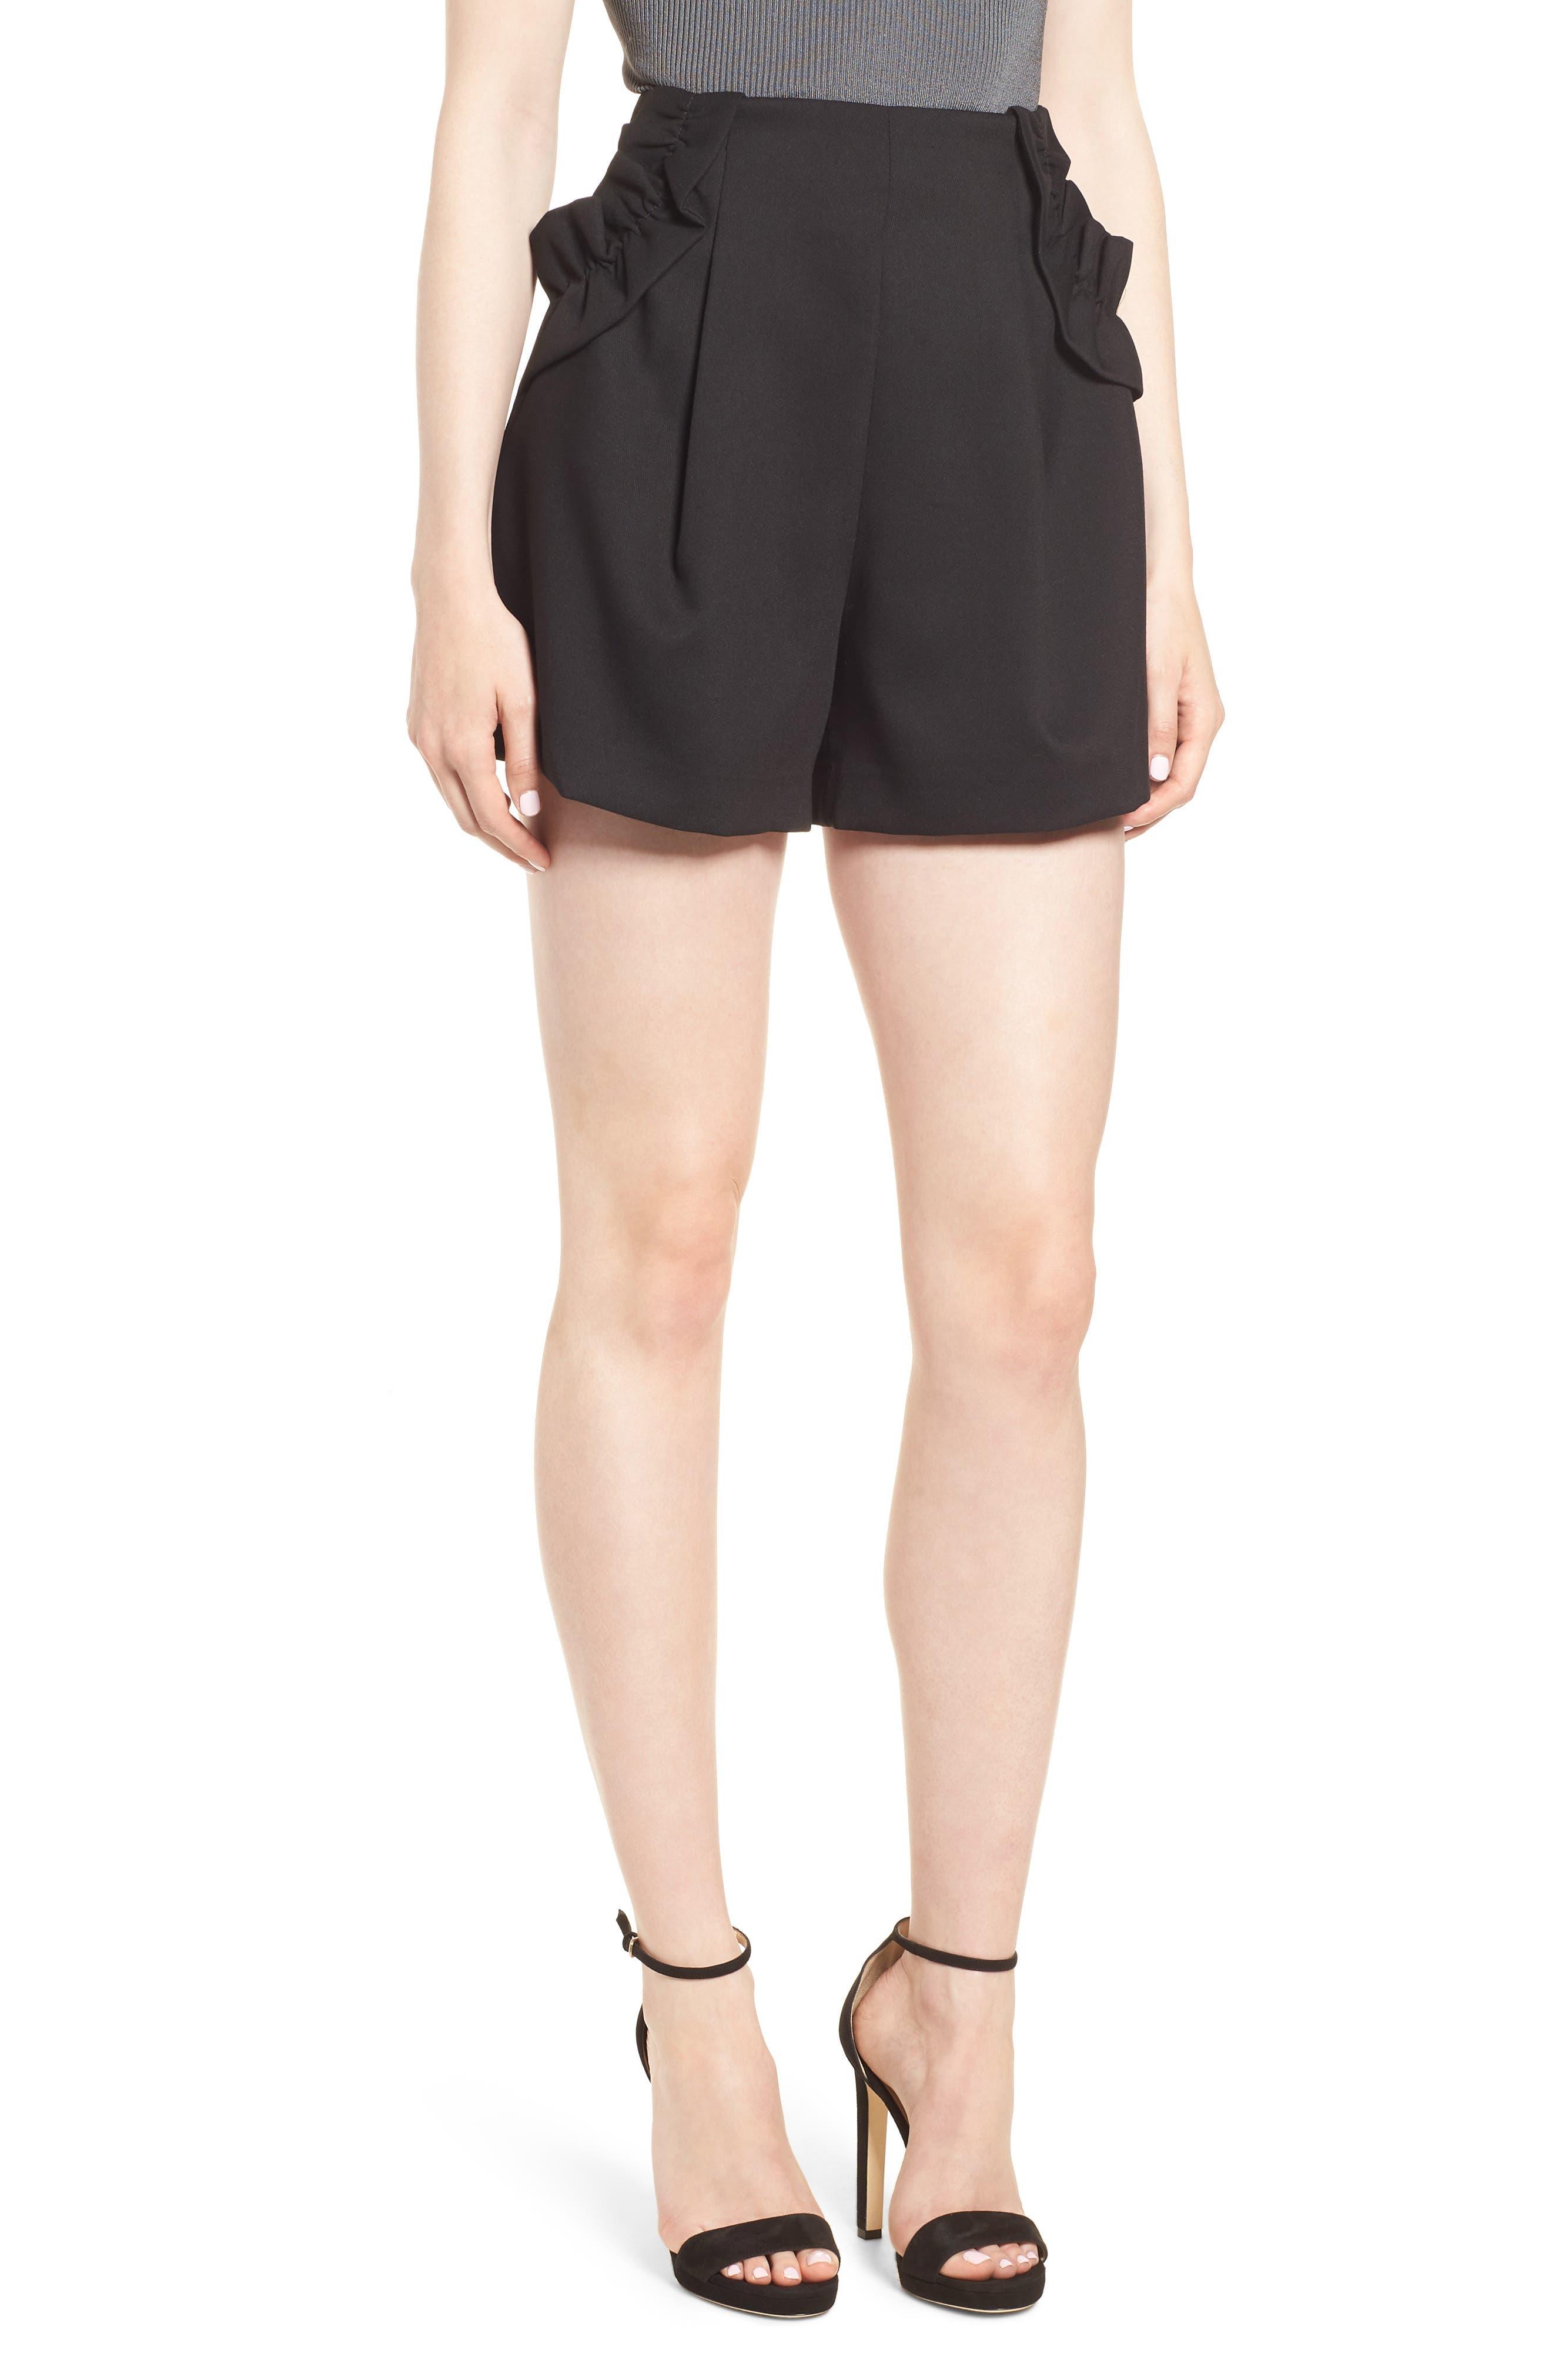 Harmony Shorts,                             Main thumbnail 1, color,                             Black